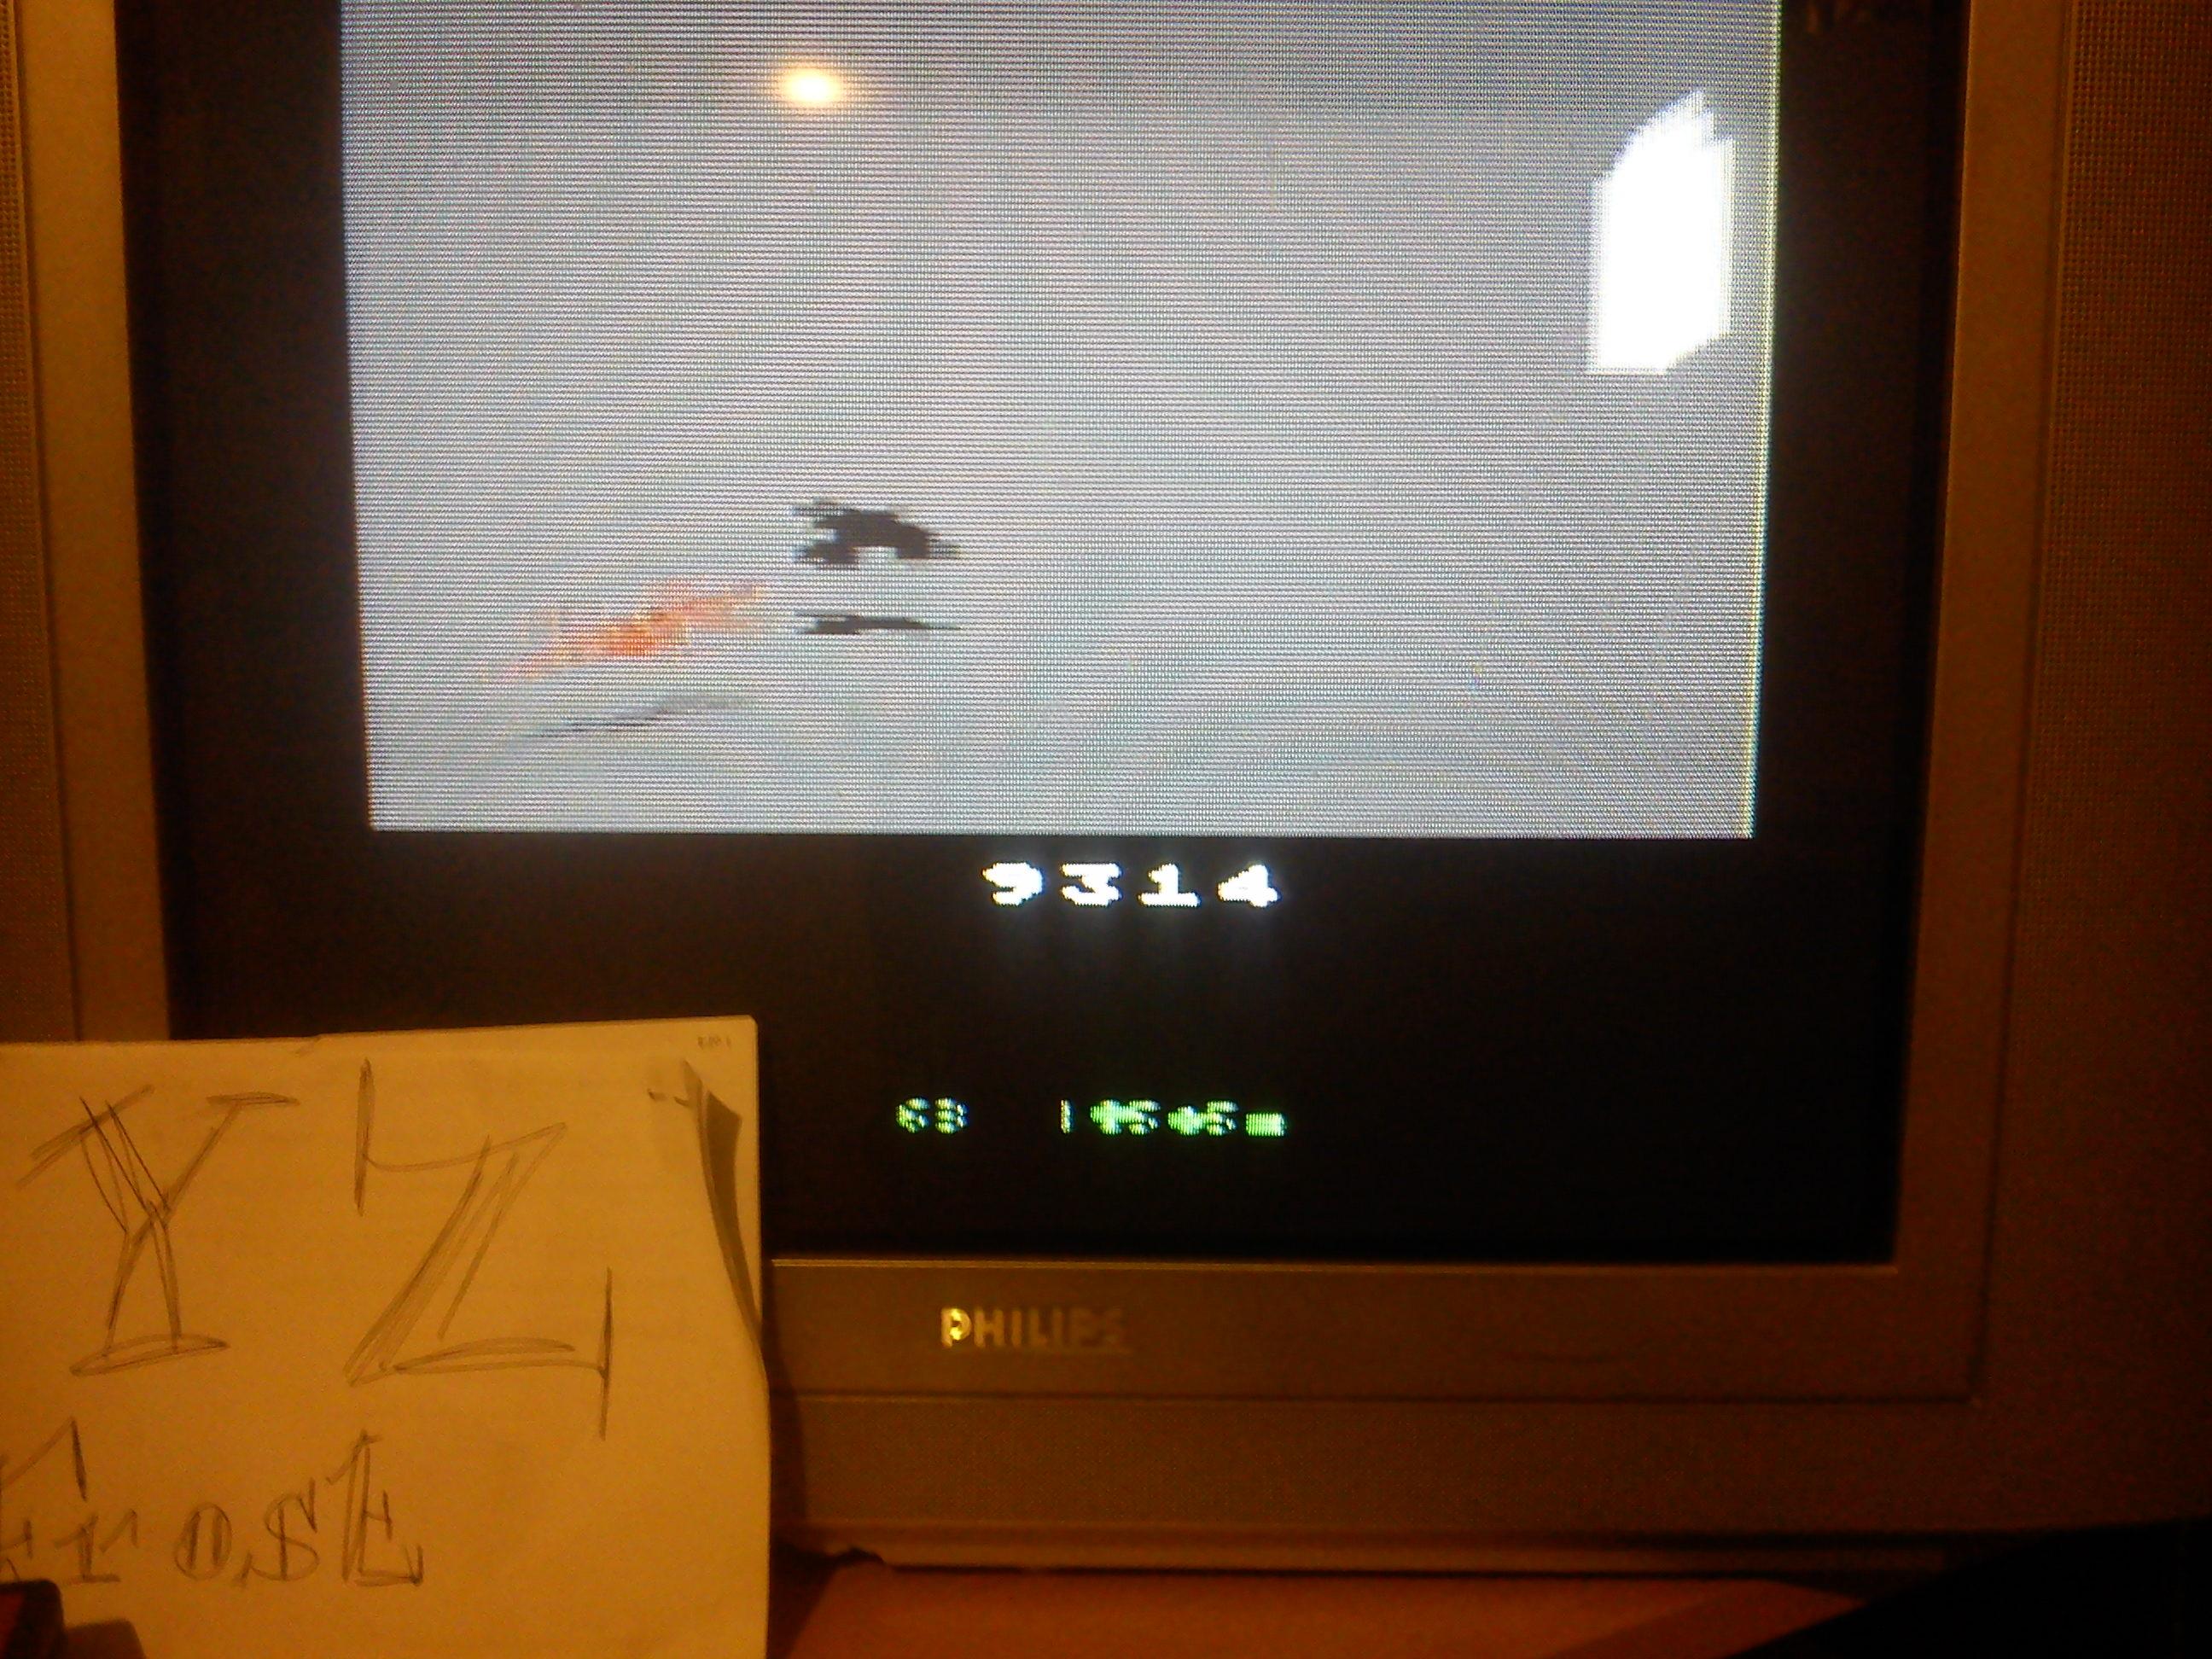 Fr0st: Desert Falcon: Novice (Atari 2600) 9,314 points on 2014-11-11 15:31:19